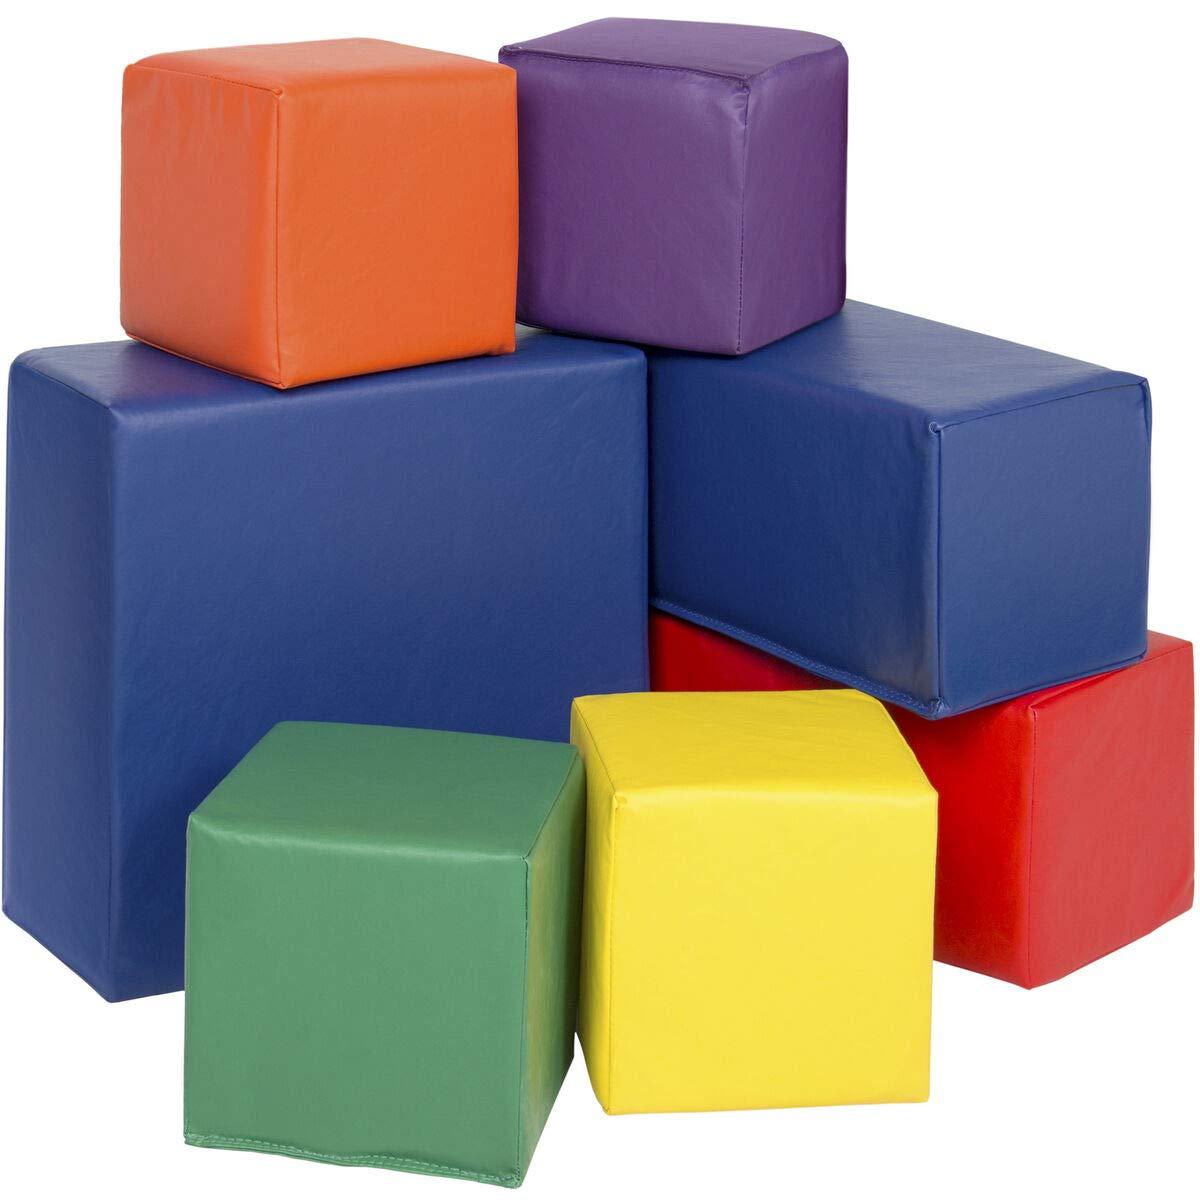 7-Piece Kids Large Stacking Soft Foam Block Play Set, Best Children's Toys 2019